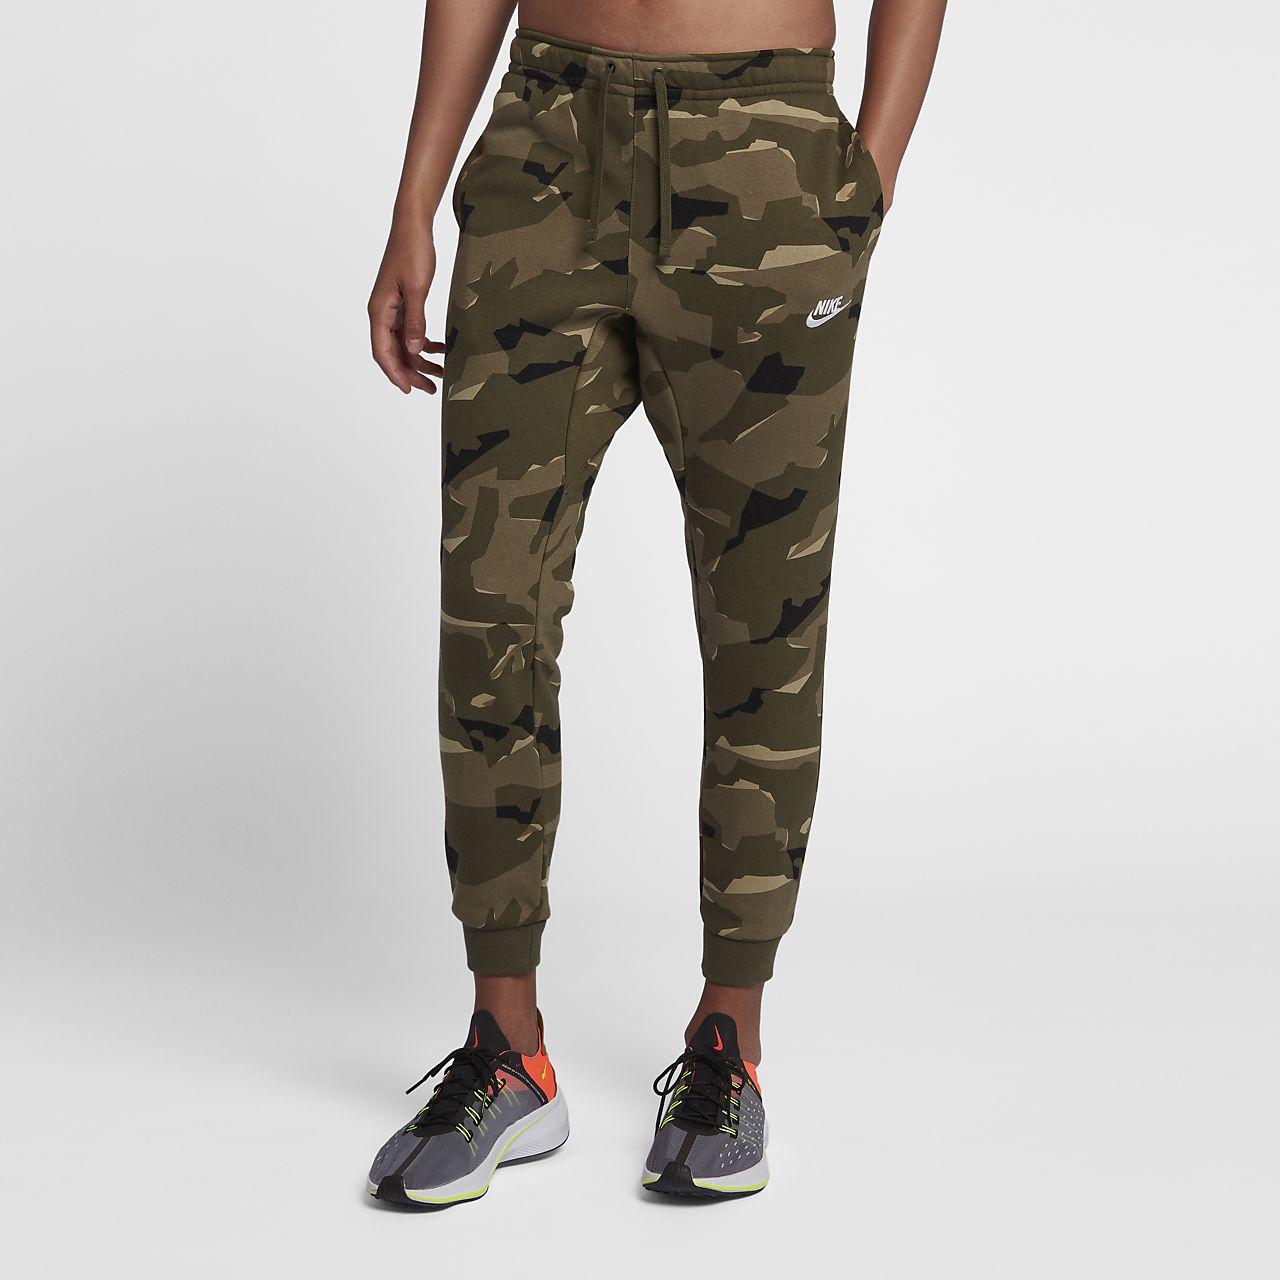 b540eb412384c Nike Sportswear Club Men's Camo Fleece Joggers. Nike.com IN